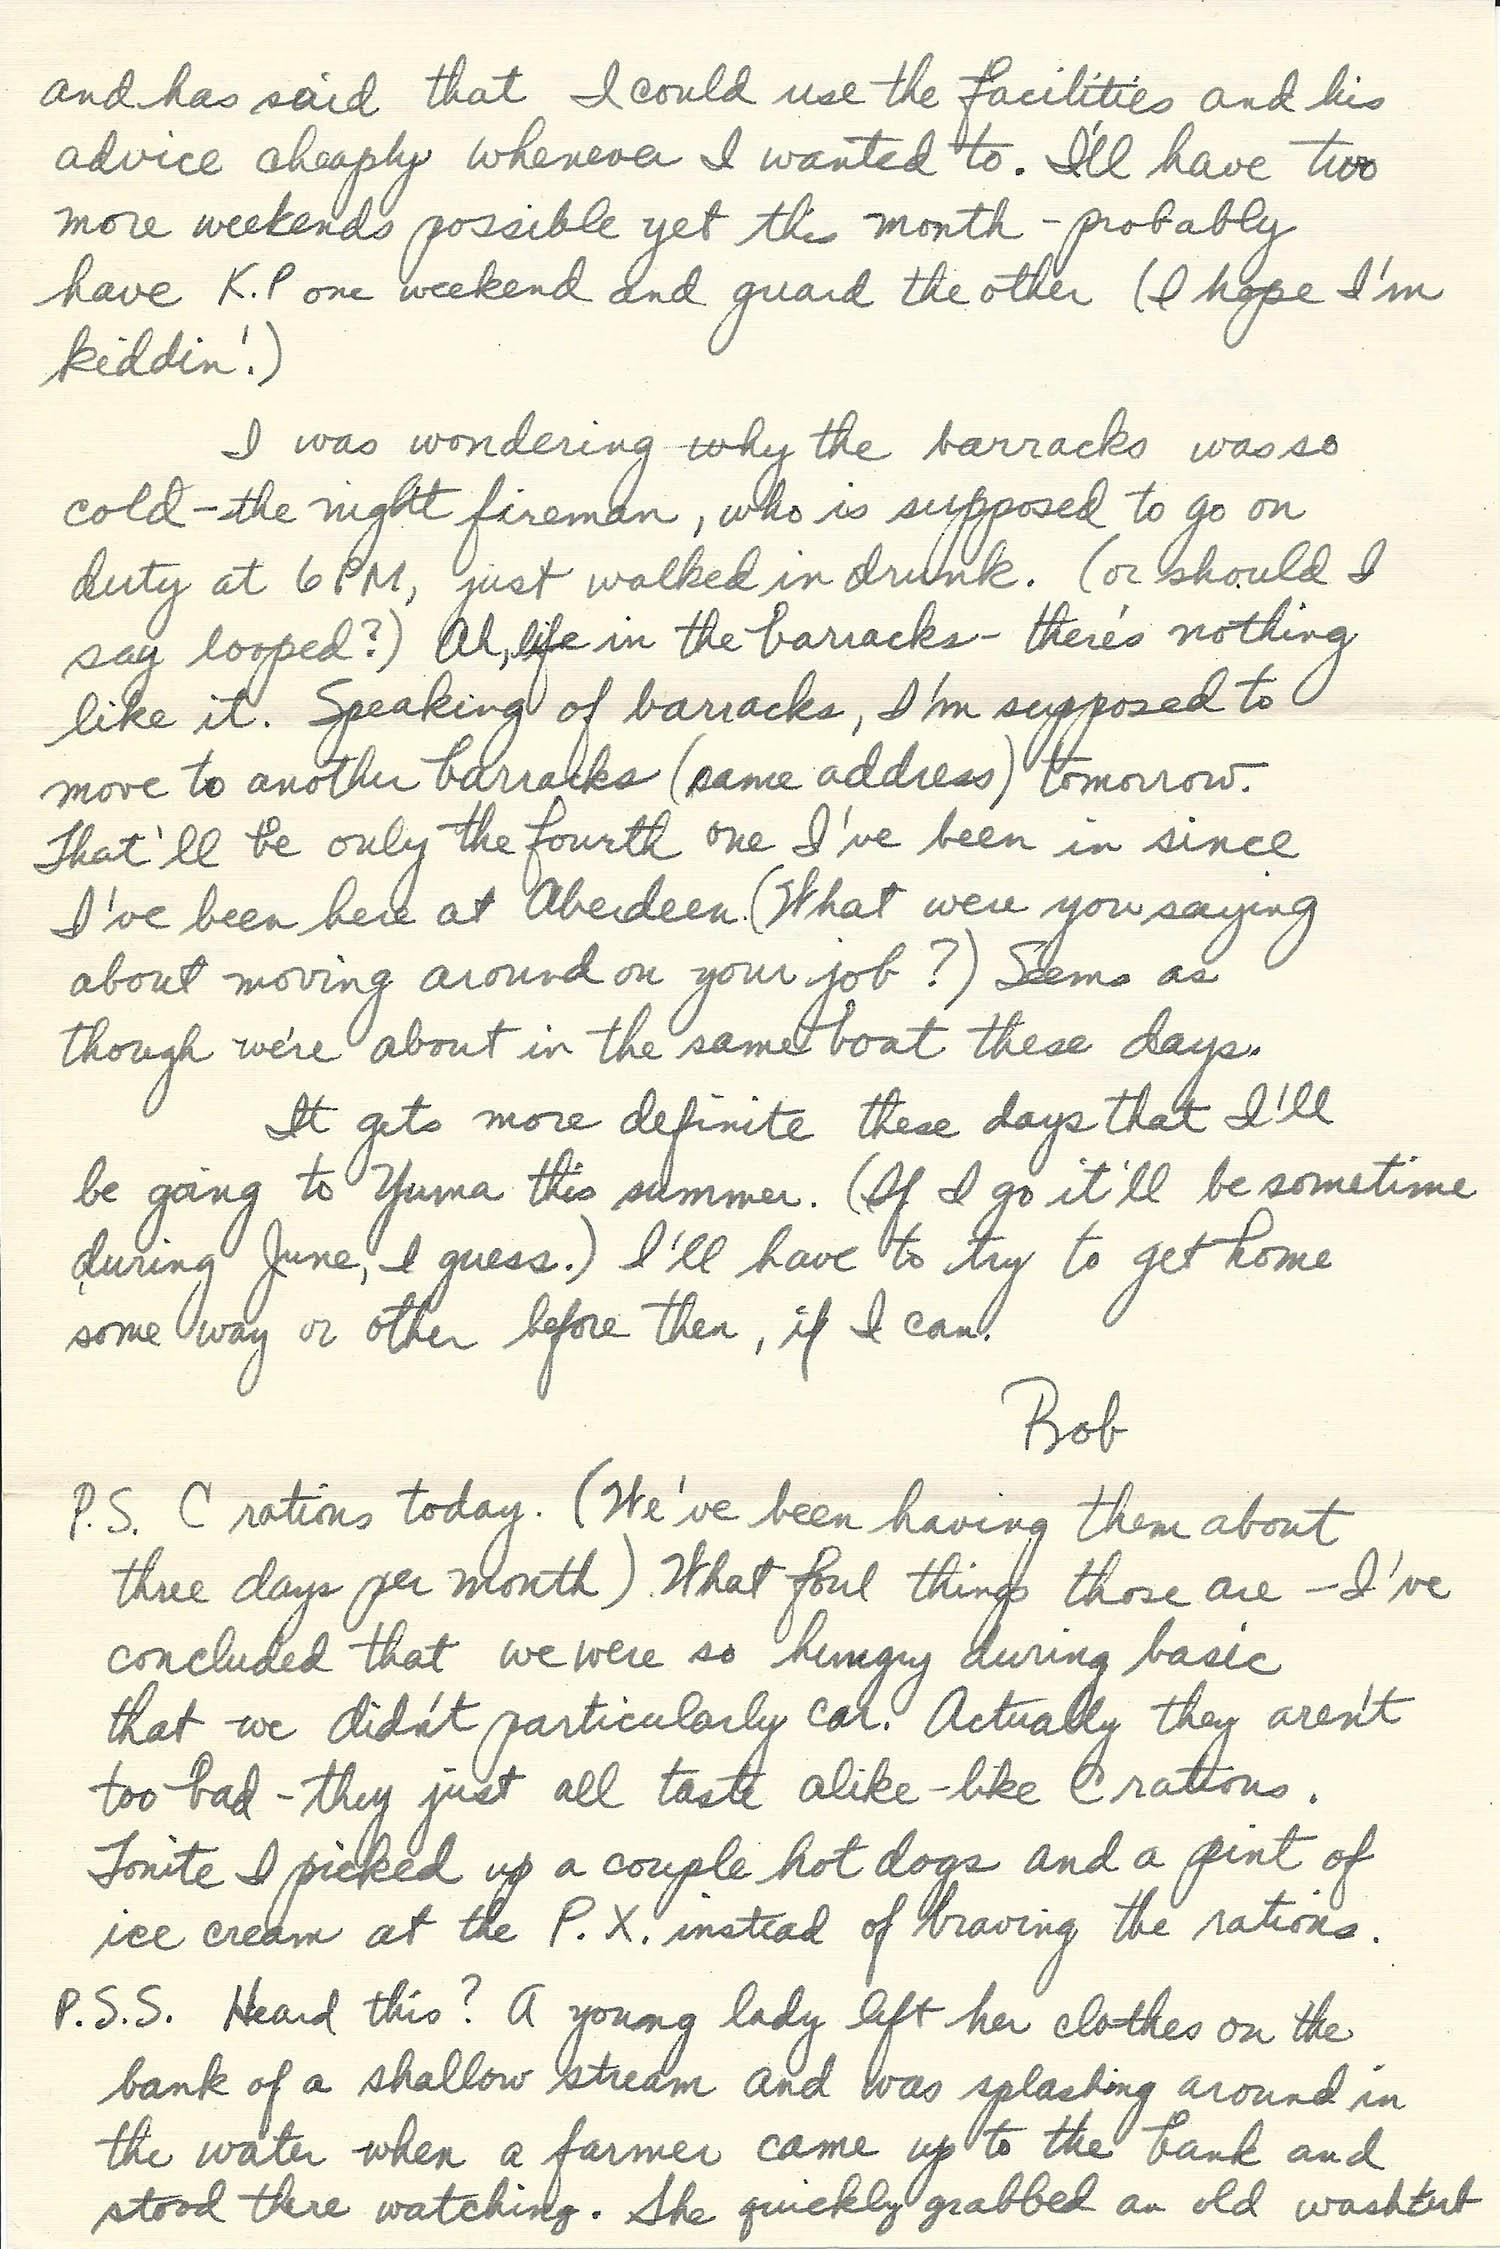 Mar. 11, 1953 (Bob) Page 3